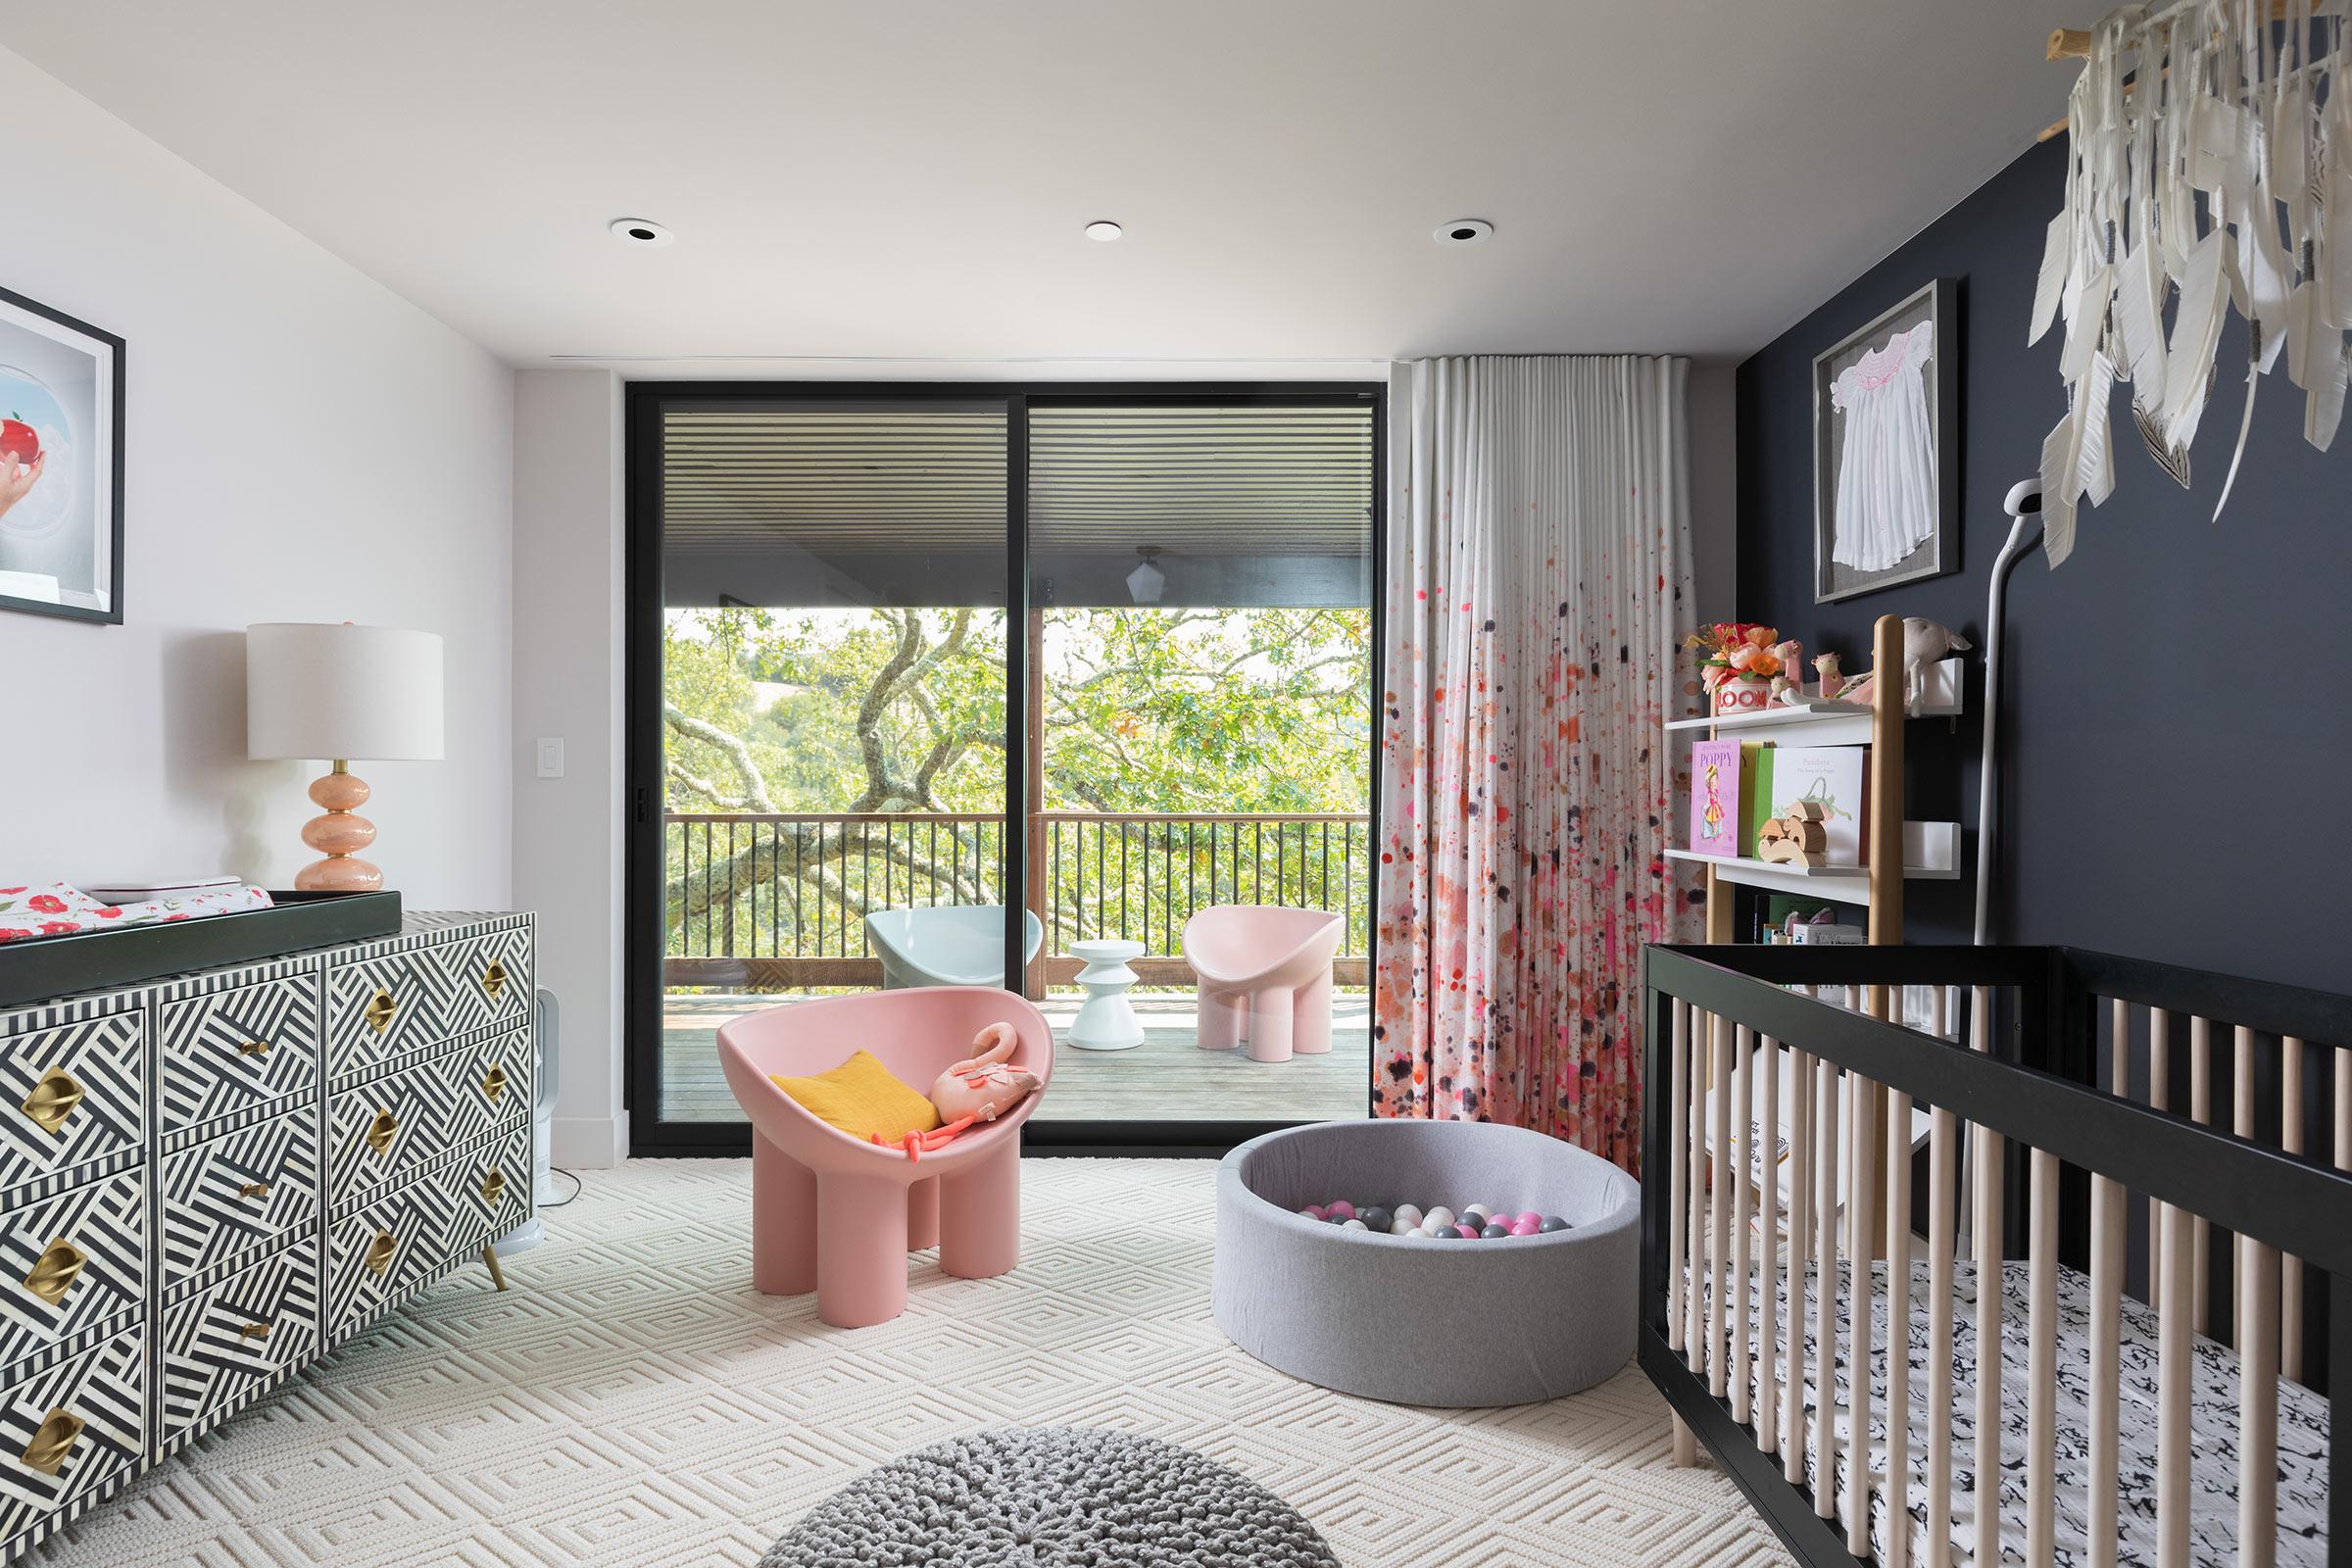 Oriinda Ridge Baby Room 1a Buestad Construction